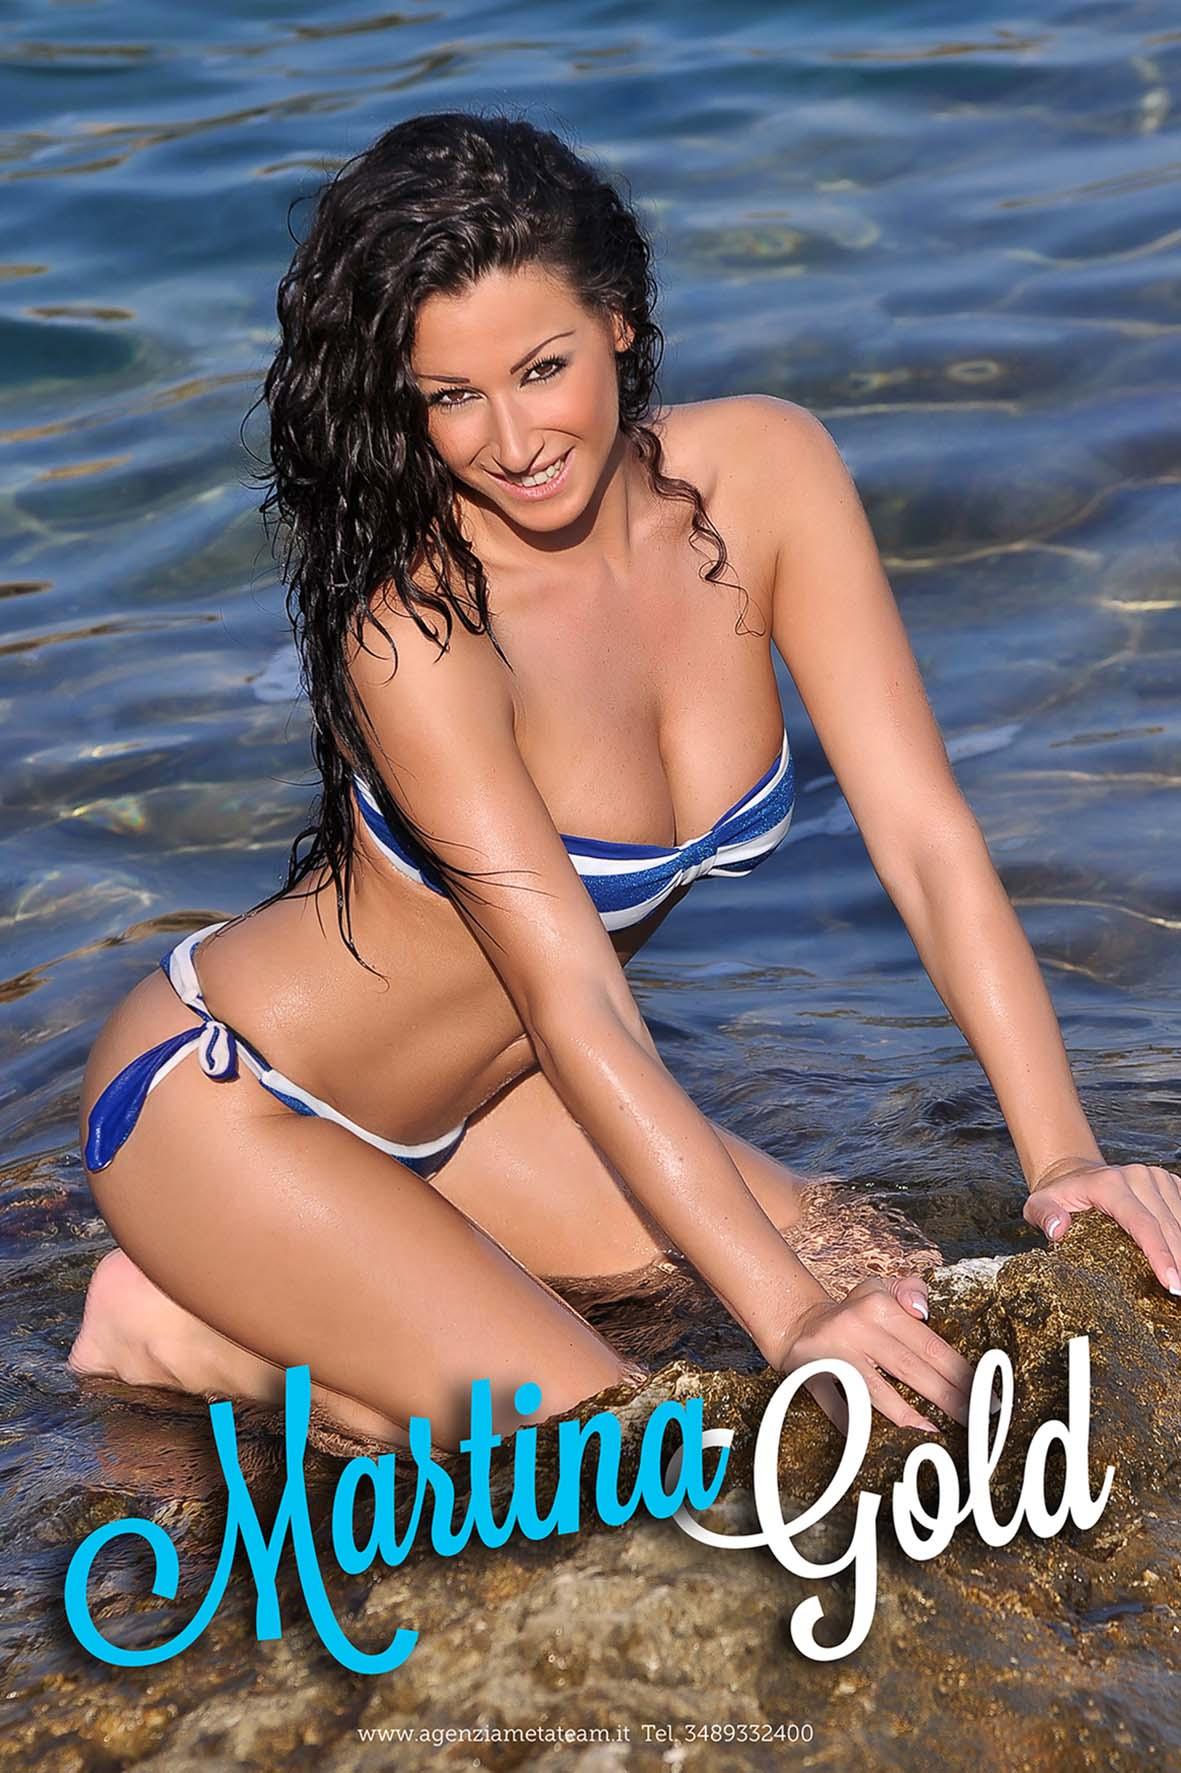 Martina Gold 7.jpg